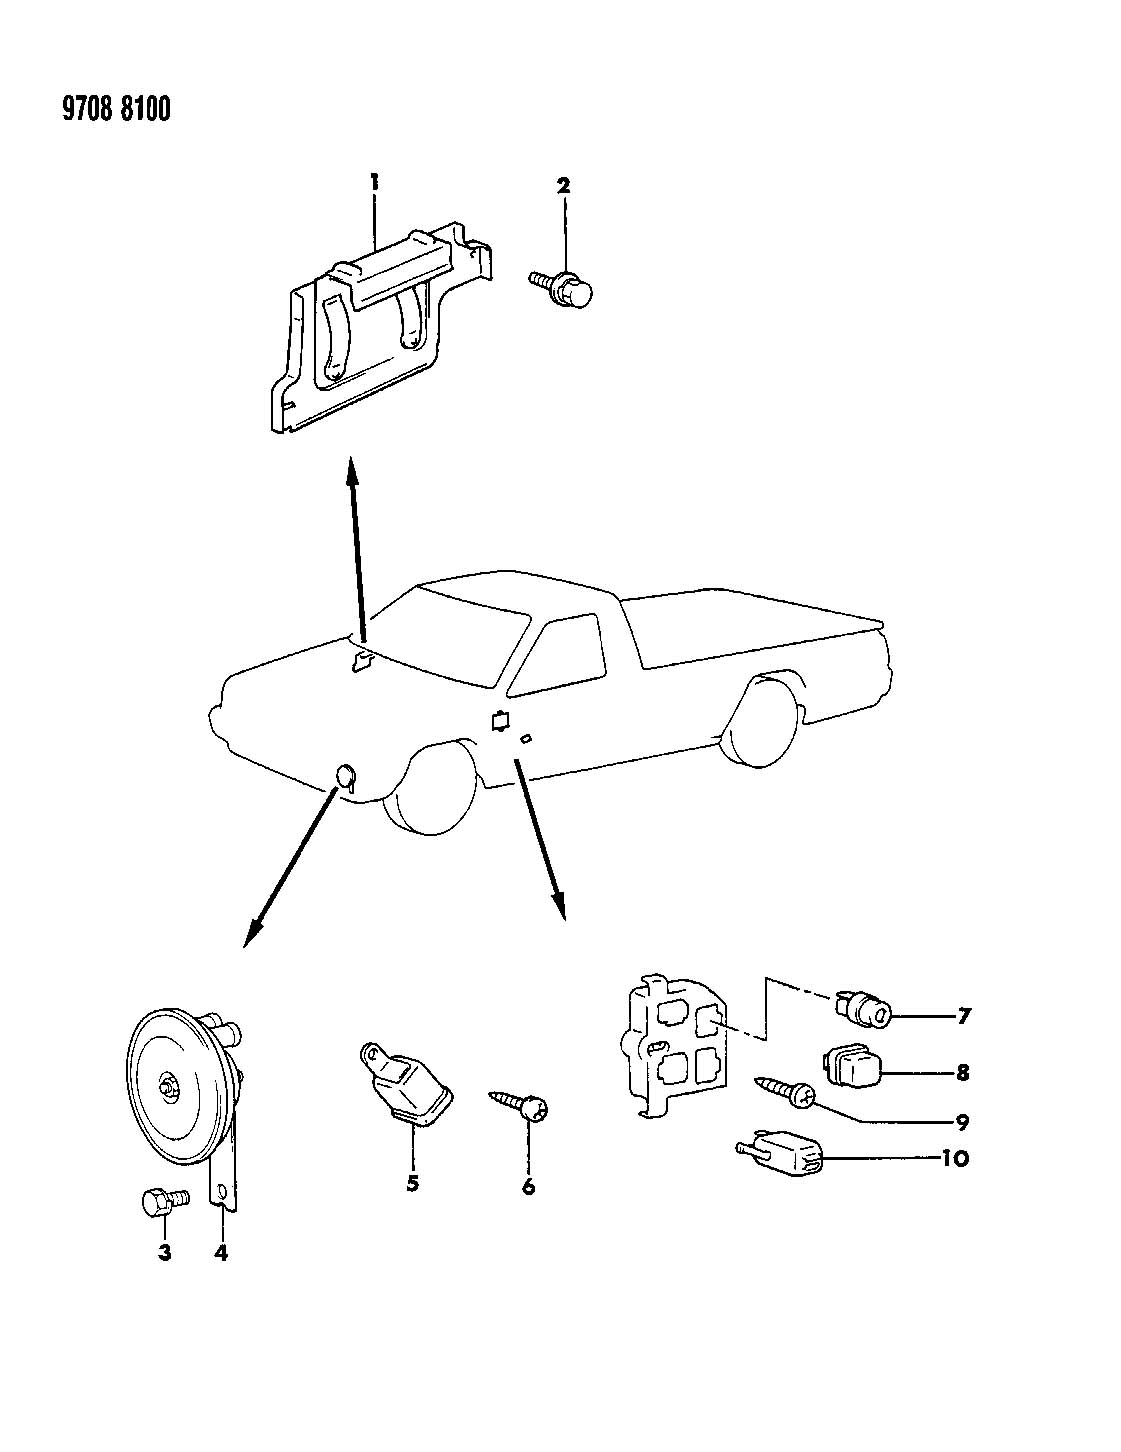 1987 mitsubishi montero carburetor diagram  1987  free